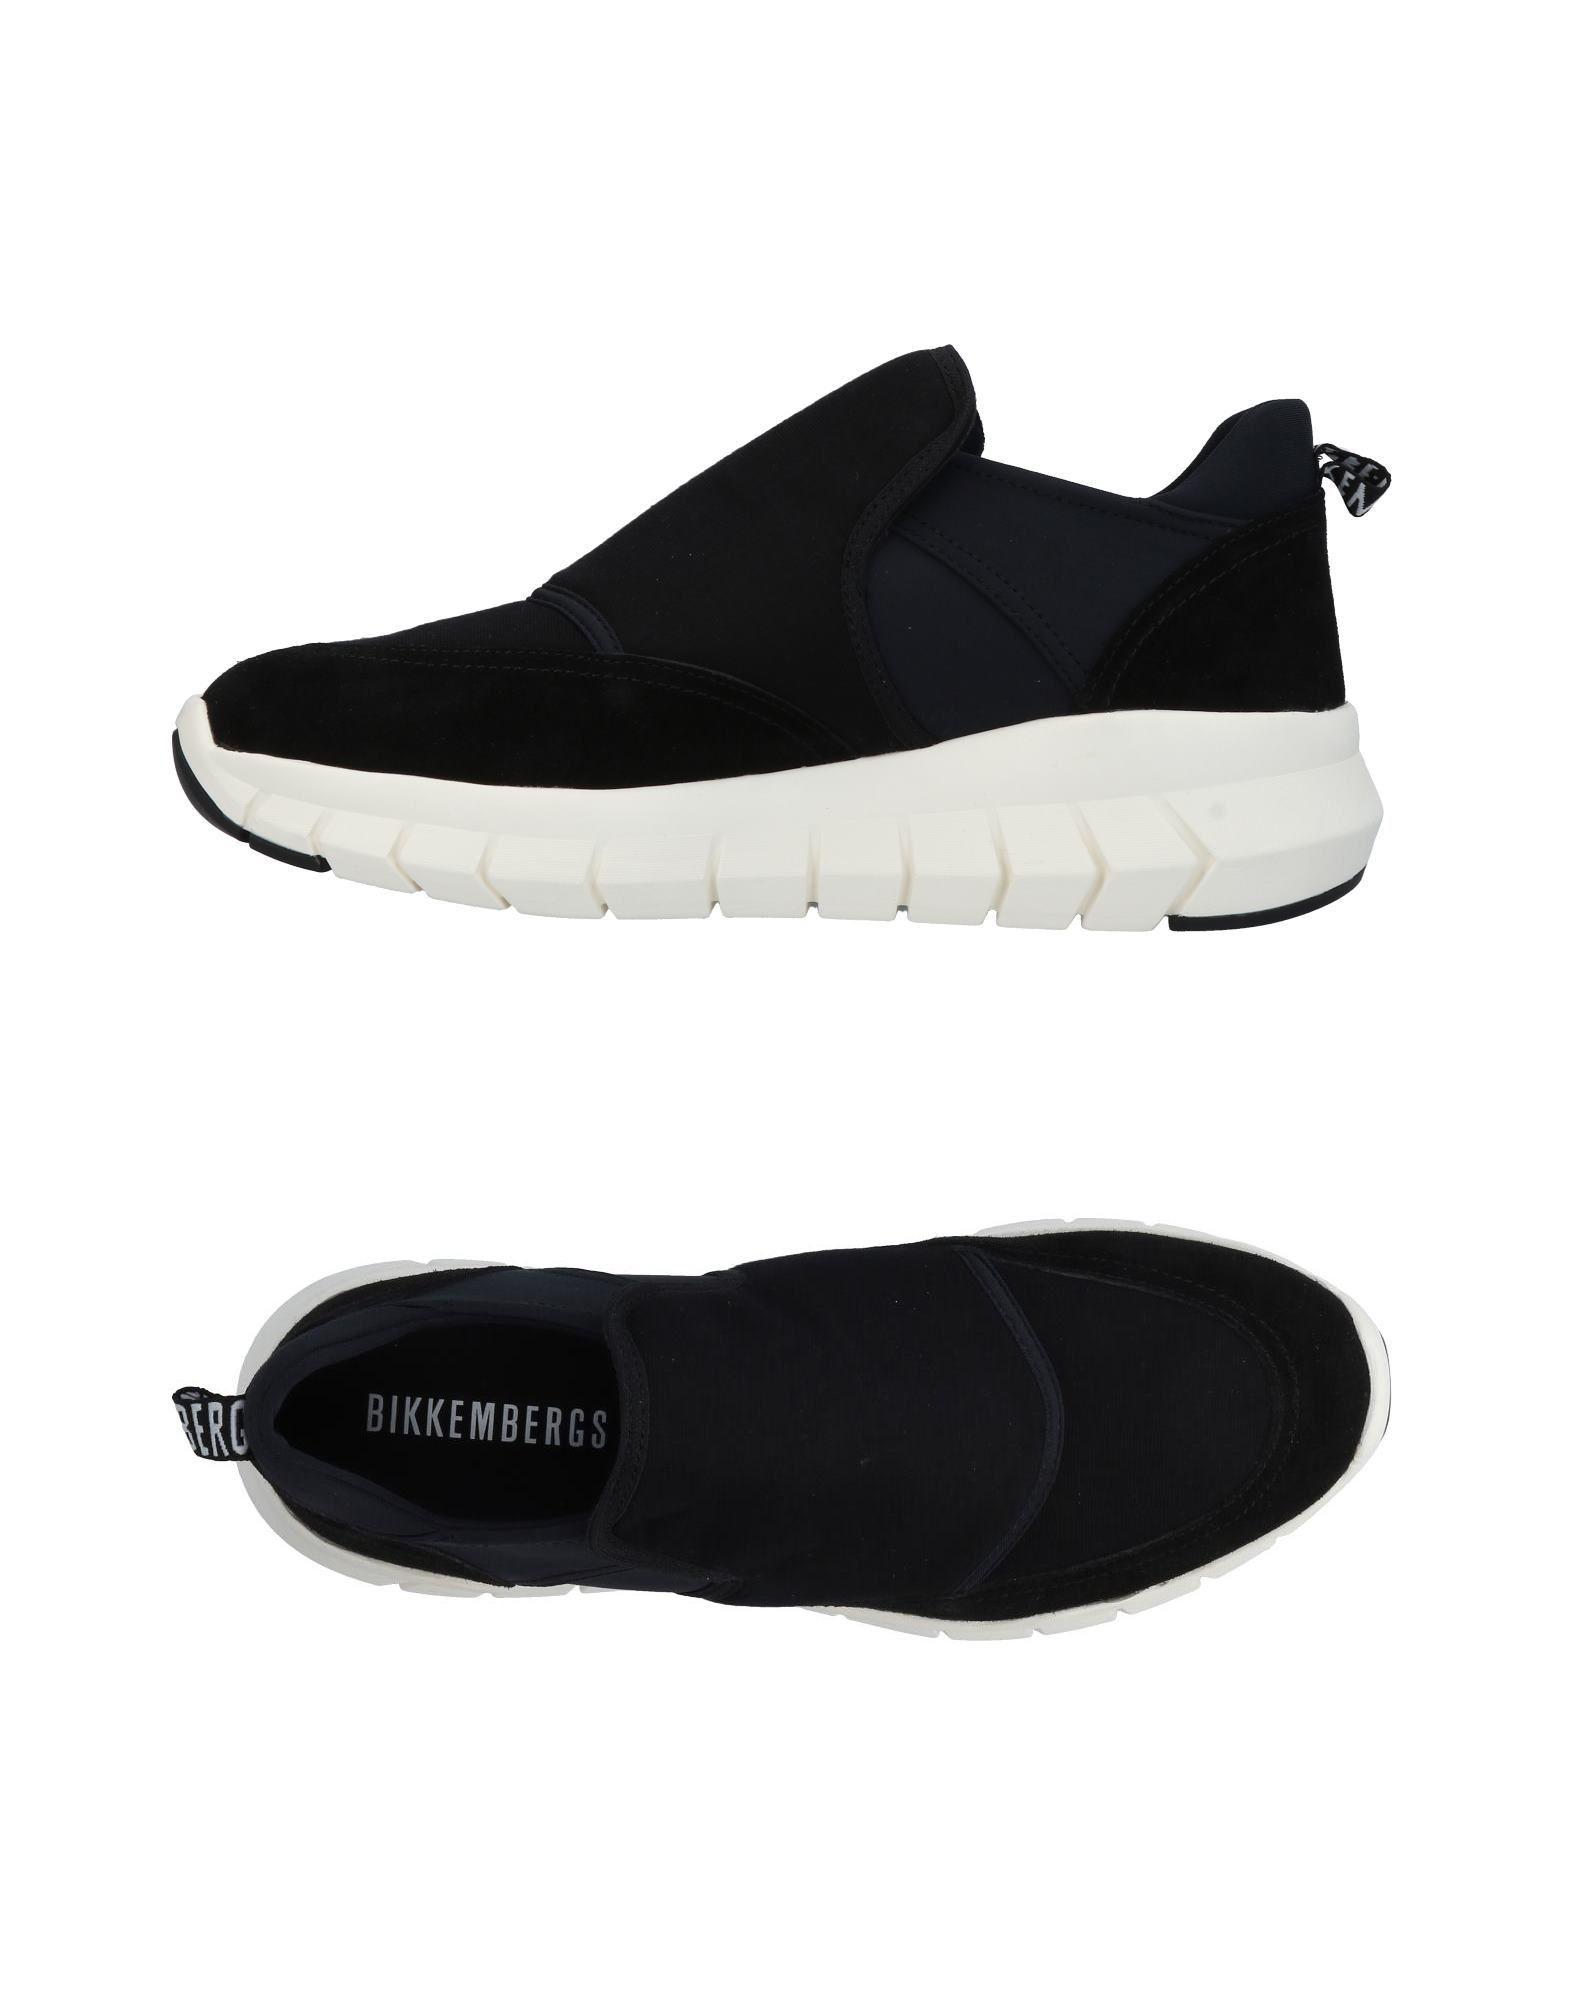 Bikkembergs Sneakers Herren  11450756AS Gute Qualität beliebte Schuhe